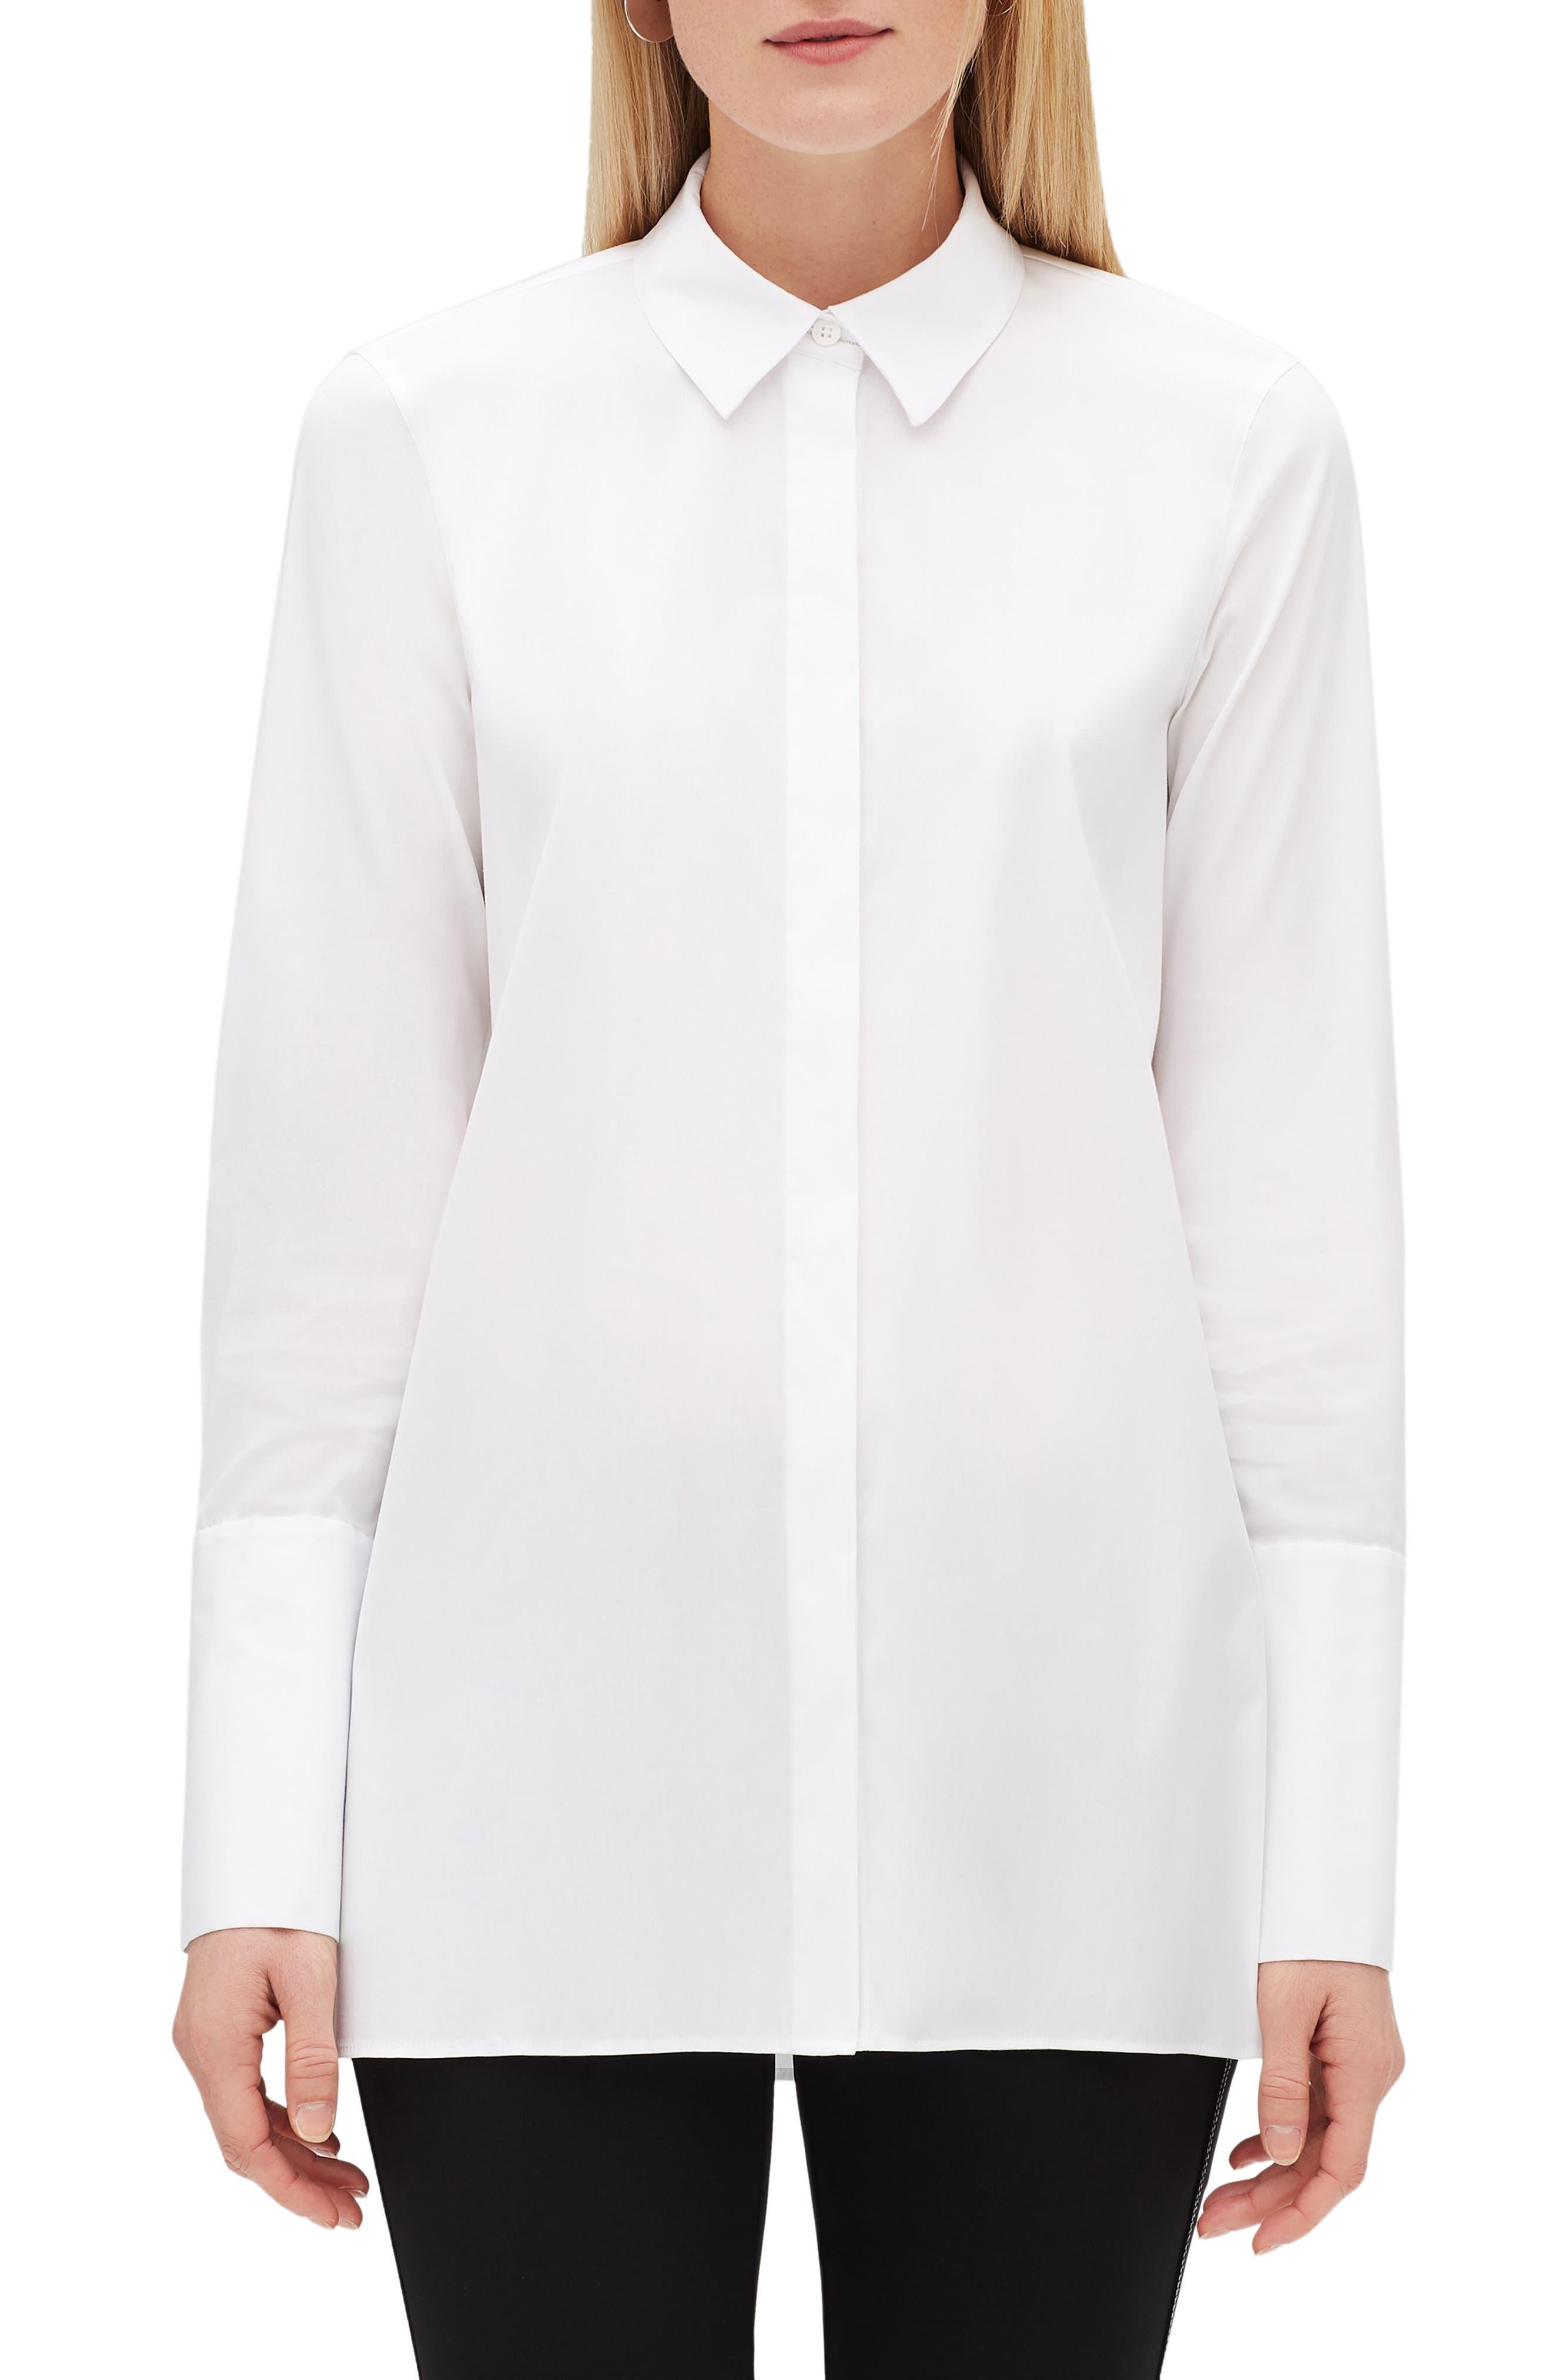 Porto Button-Front Blouse With Chain-Trim Collar in White